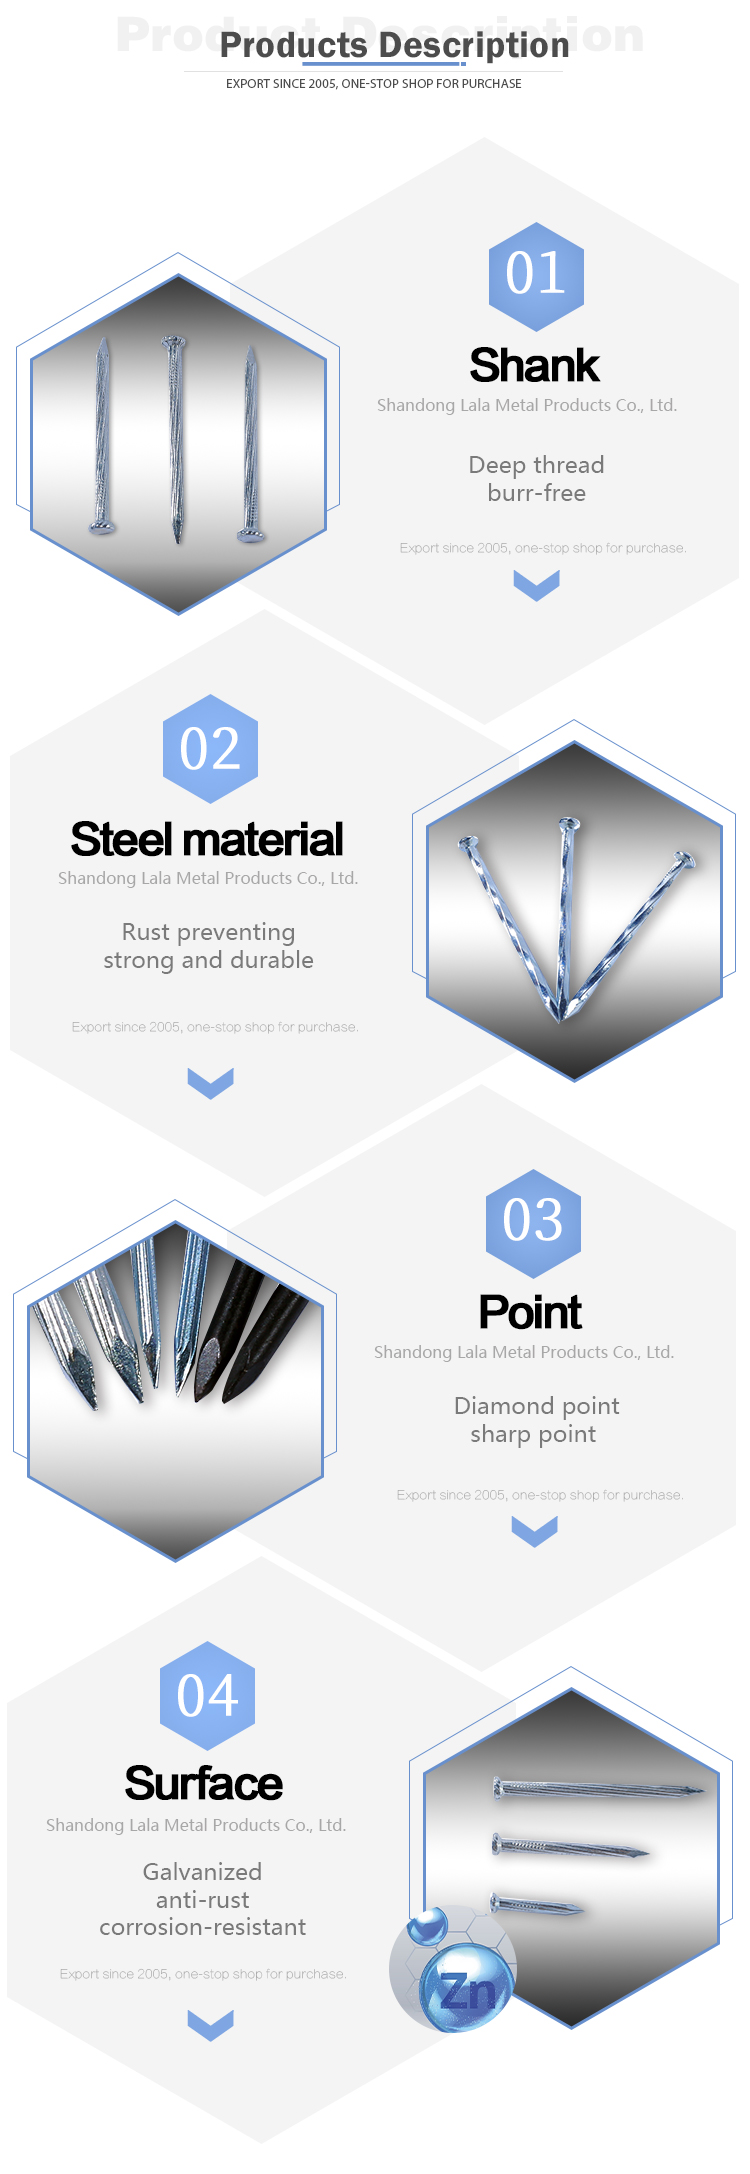 2020 Hot Sale Galvanized Steel Concrete Electric Galvanized Nail Concrete Nails